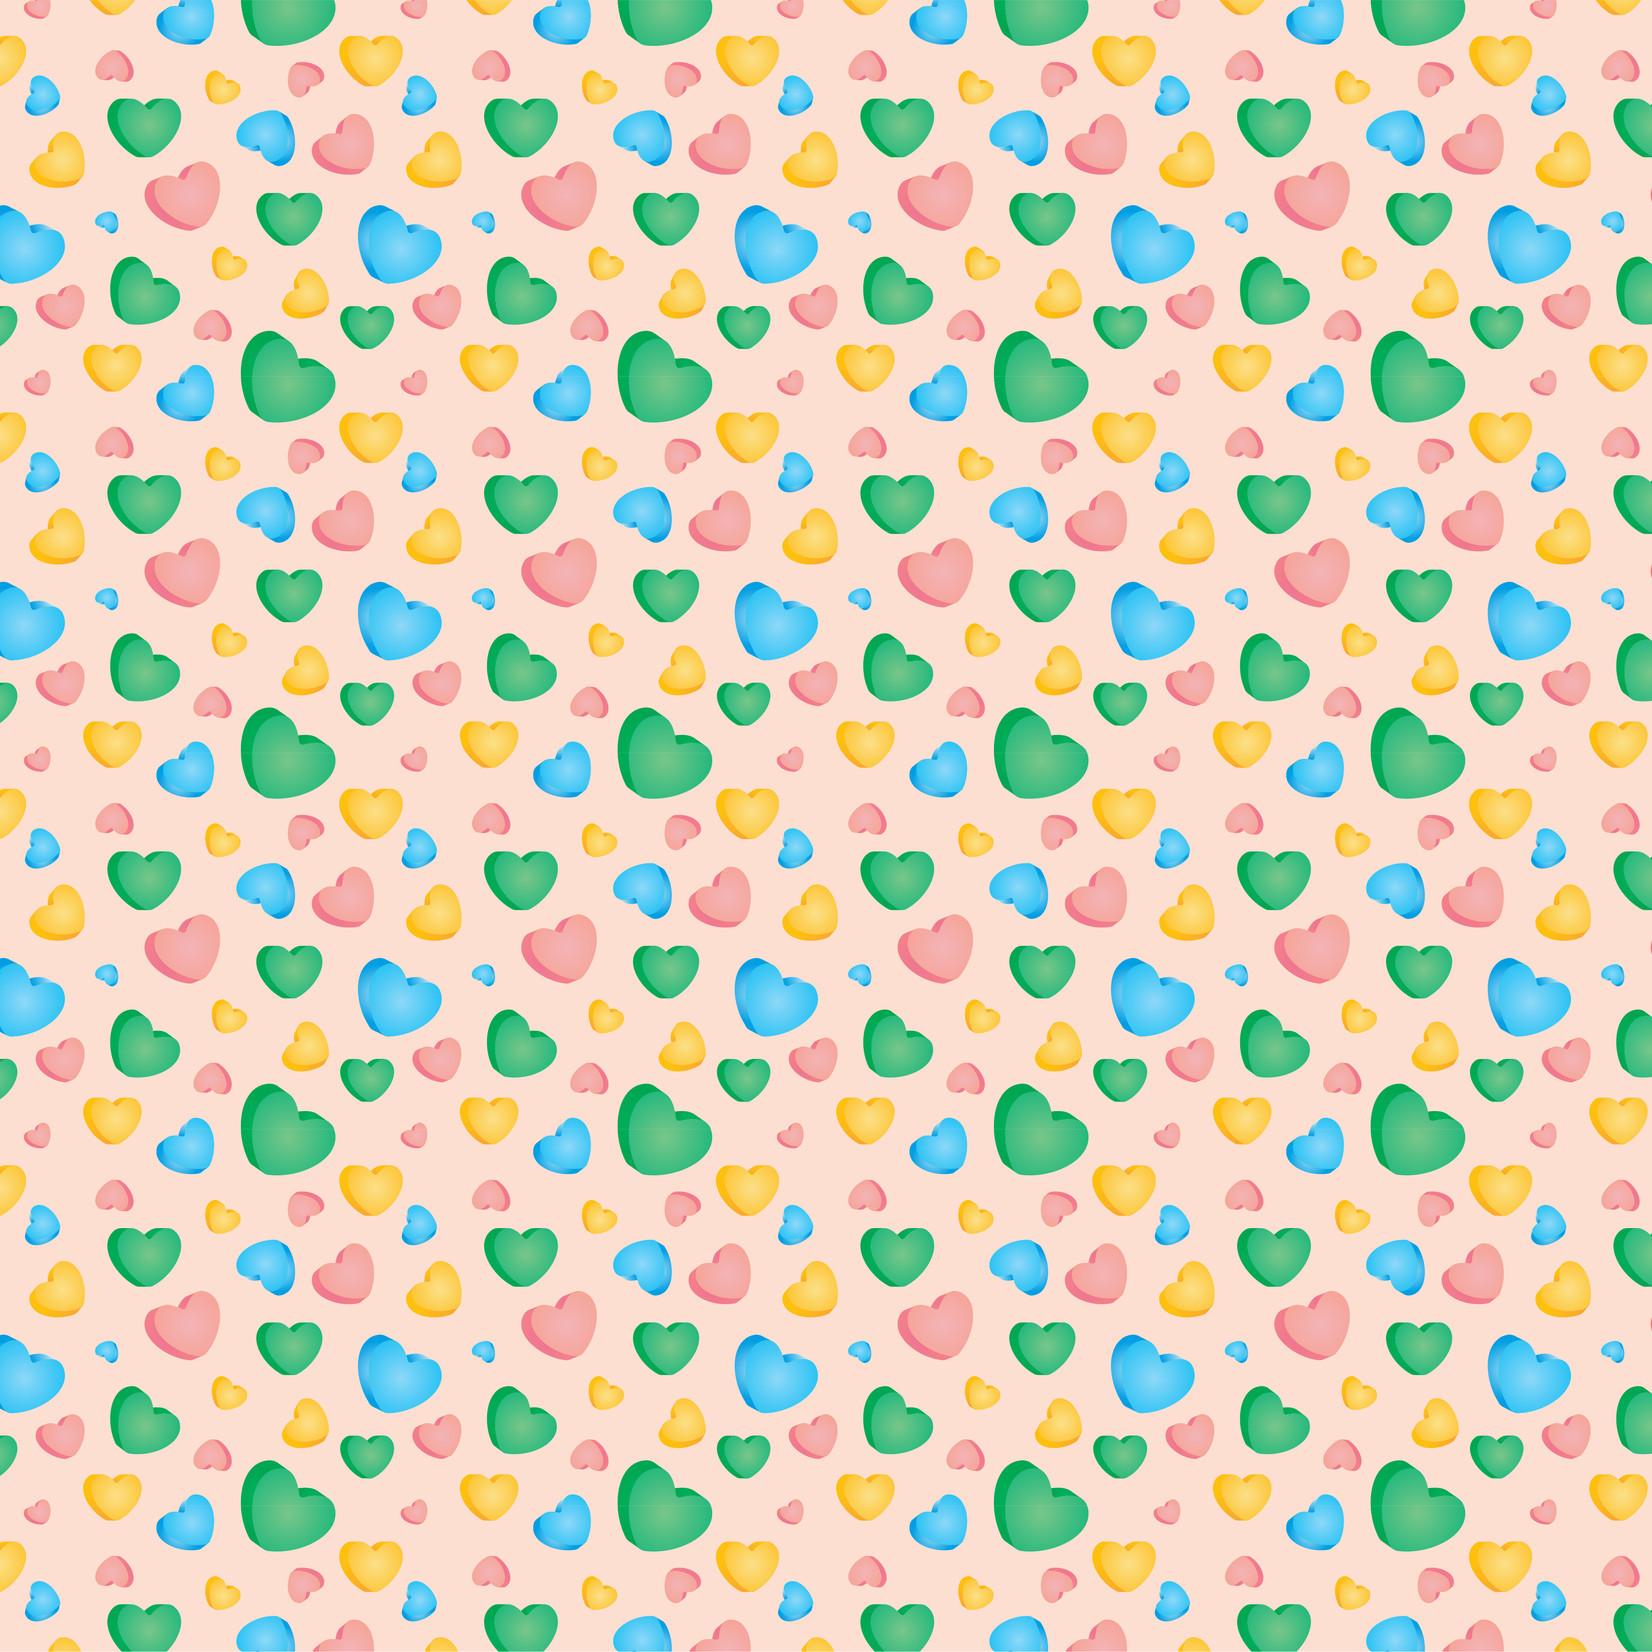 TVD Candy Hearts